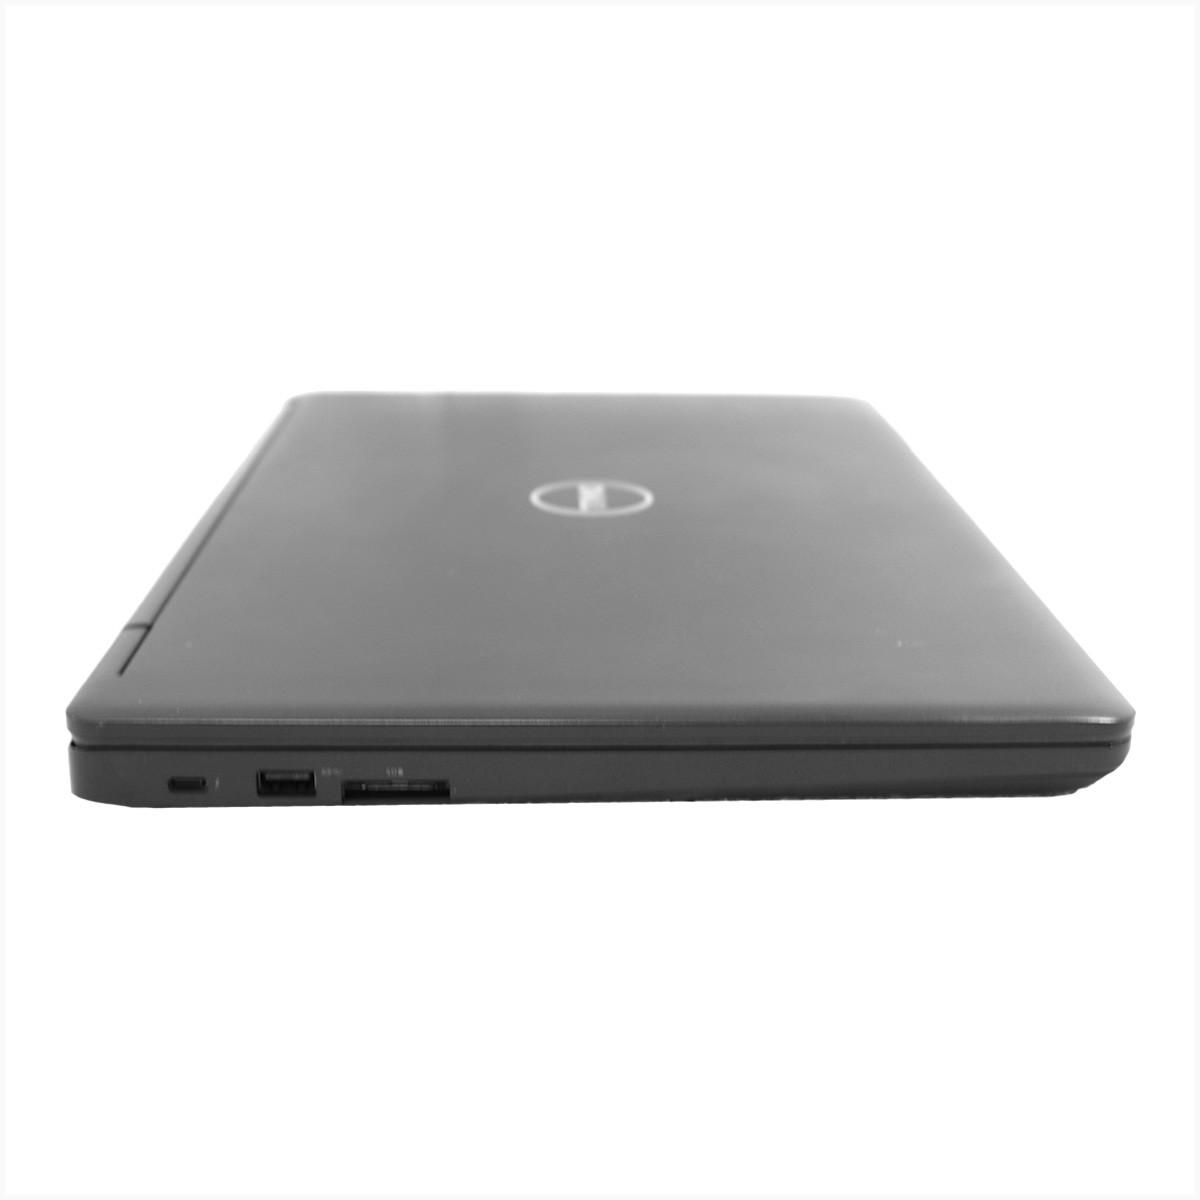 Workbook Dell 3520 i7 8gb 240gb Ssd M.2 - Usado